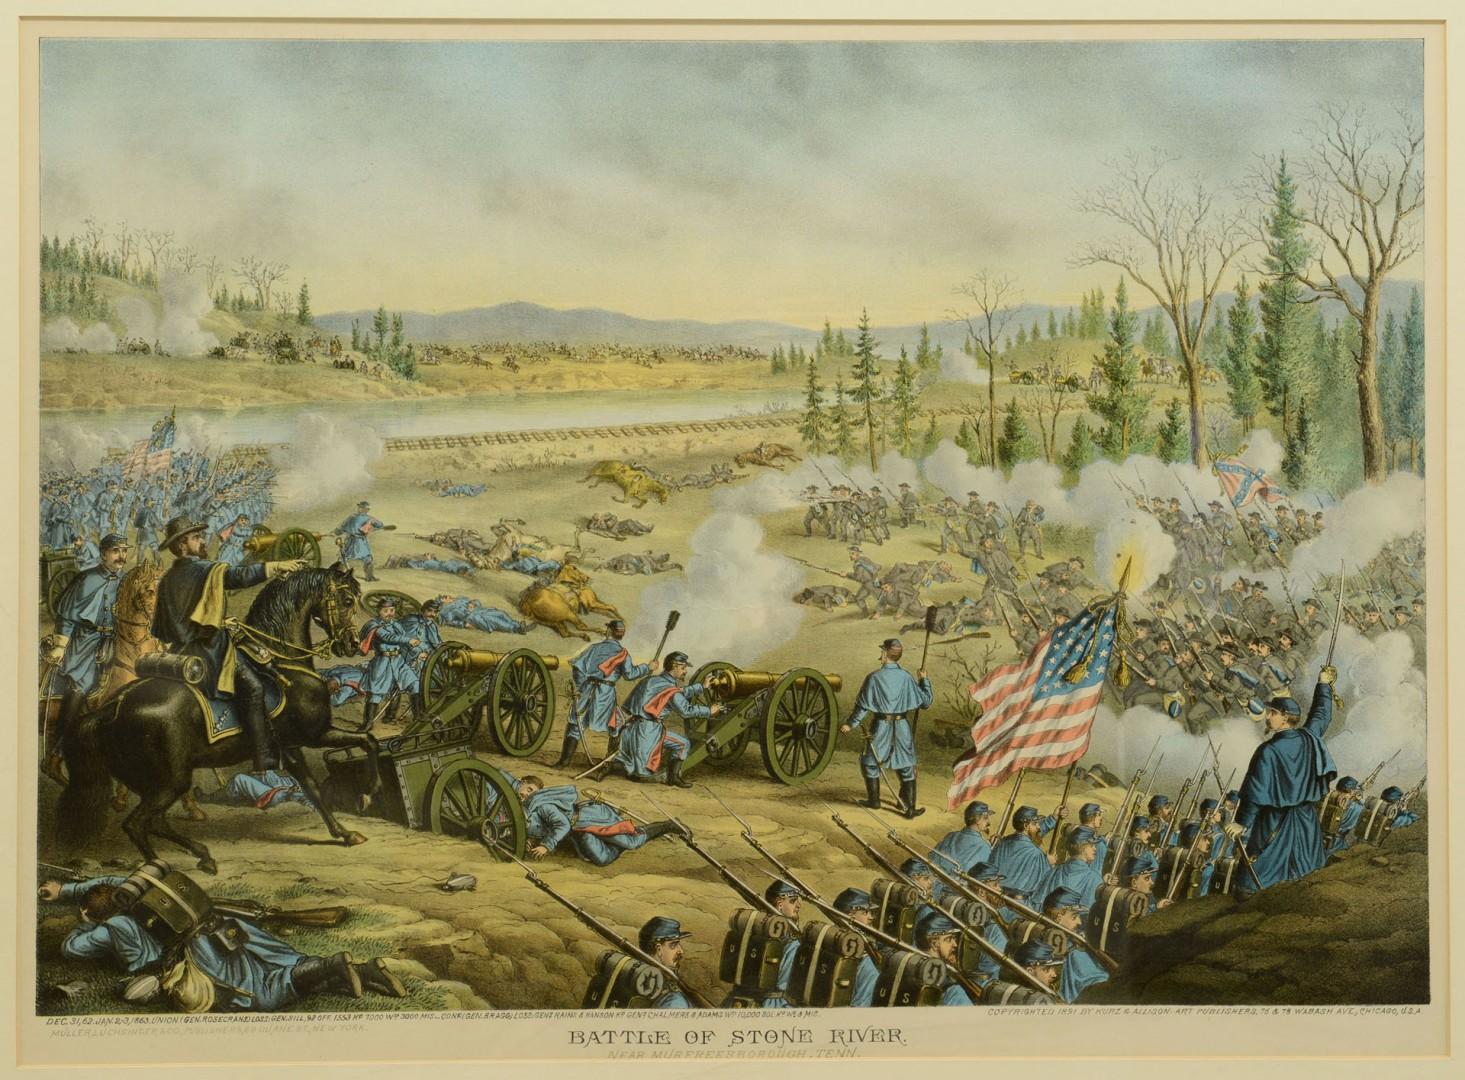 5 Kurz & Allison Civil War Battle Prints